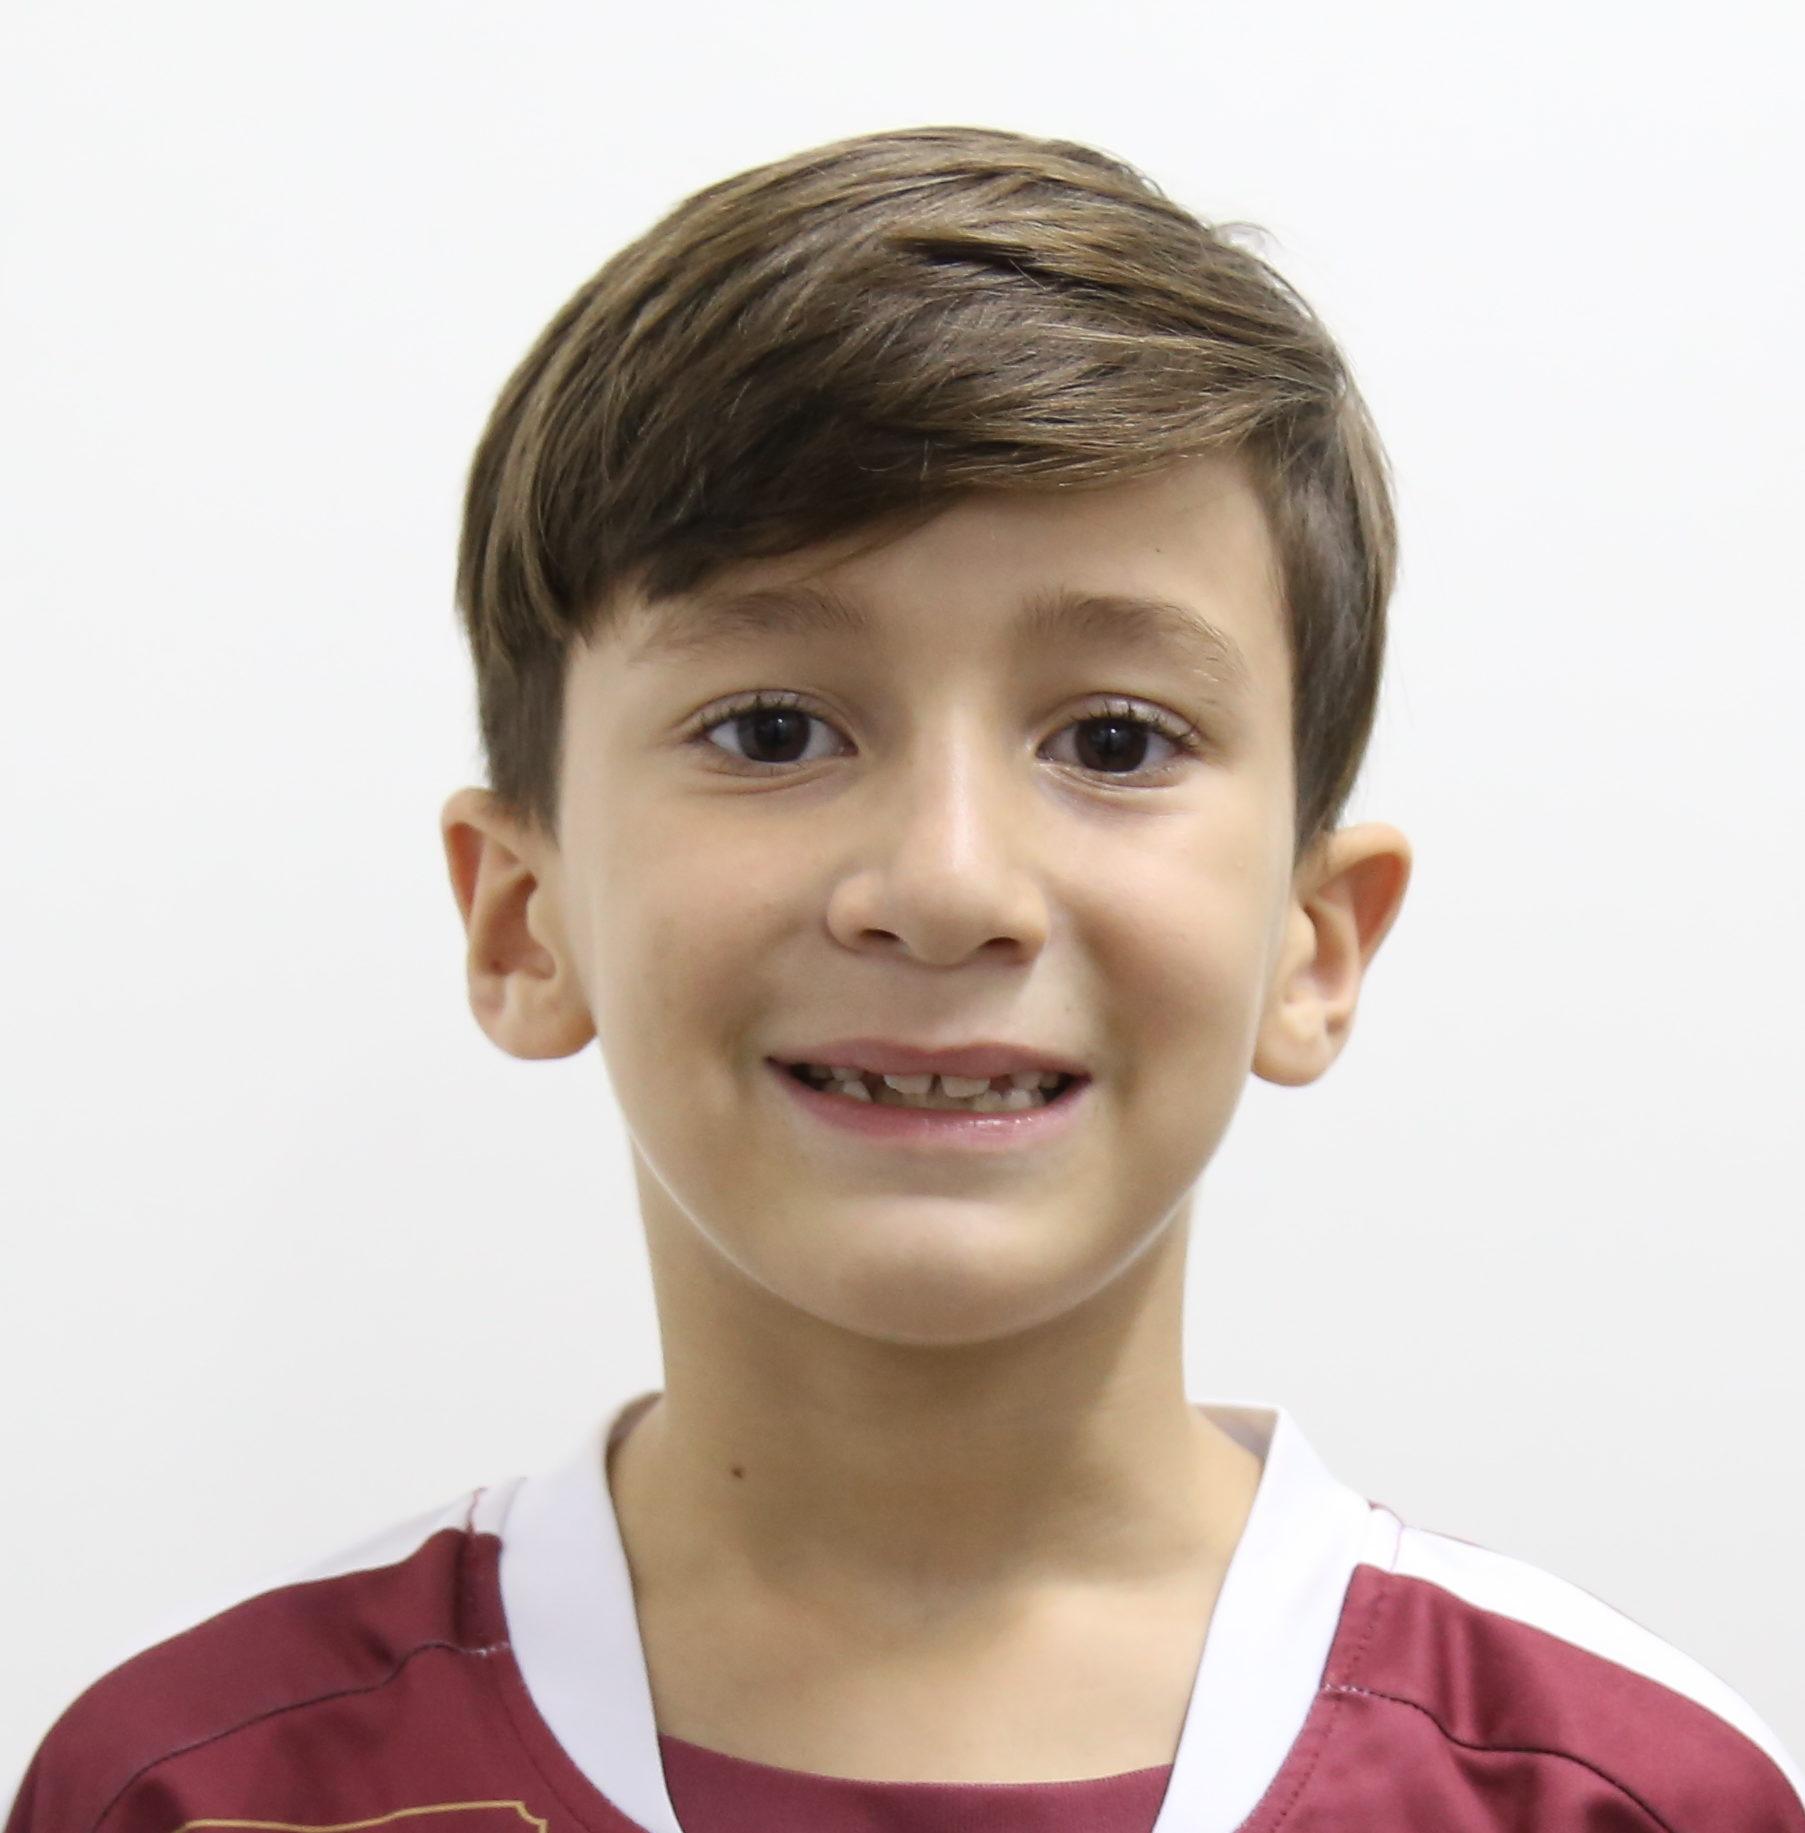 08 – Lucas Serrano (28-01-2010) – FIXO